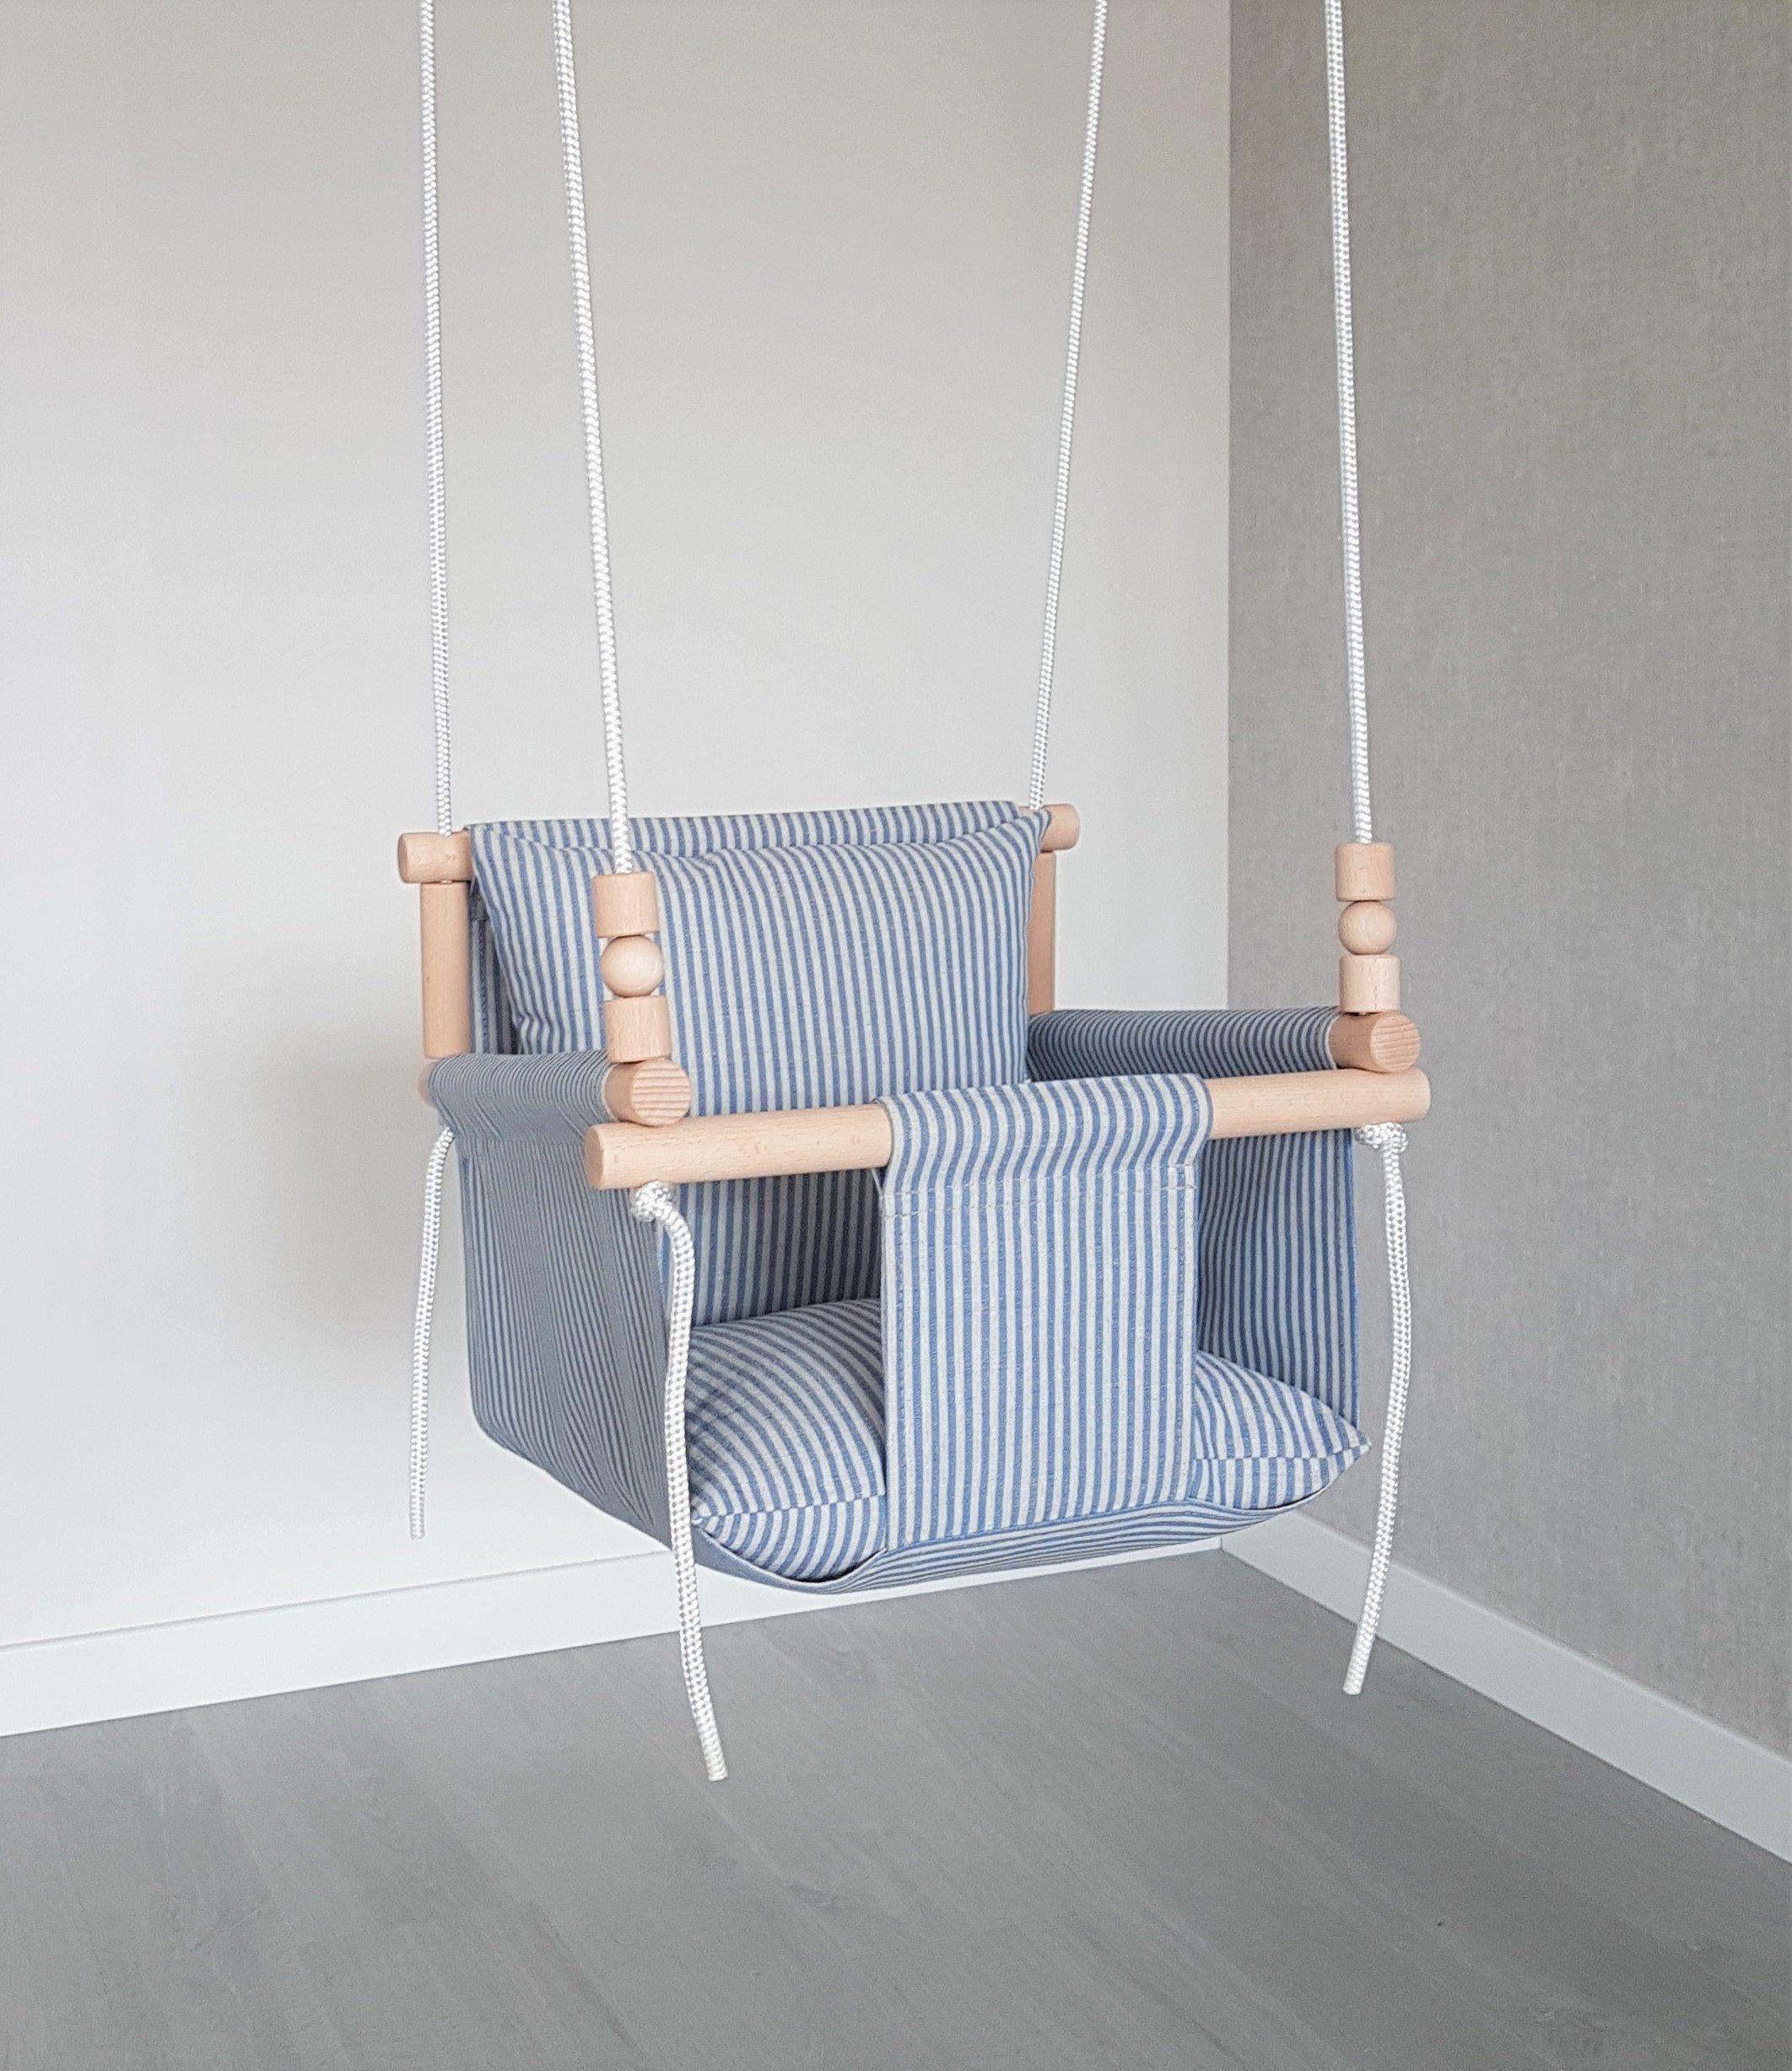 Comfortable Design Natural Linen Baby Swing Ships Fast Toddler Swing Linen Swing Indoor Swing First Birthday G Toddler Swing Baby Swings Baby Swing Chair